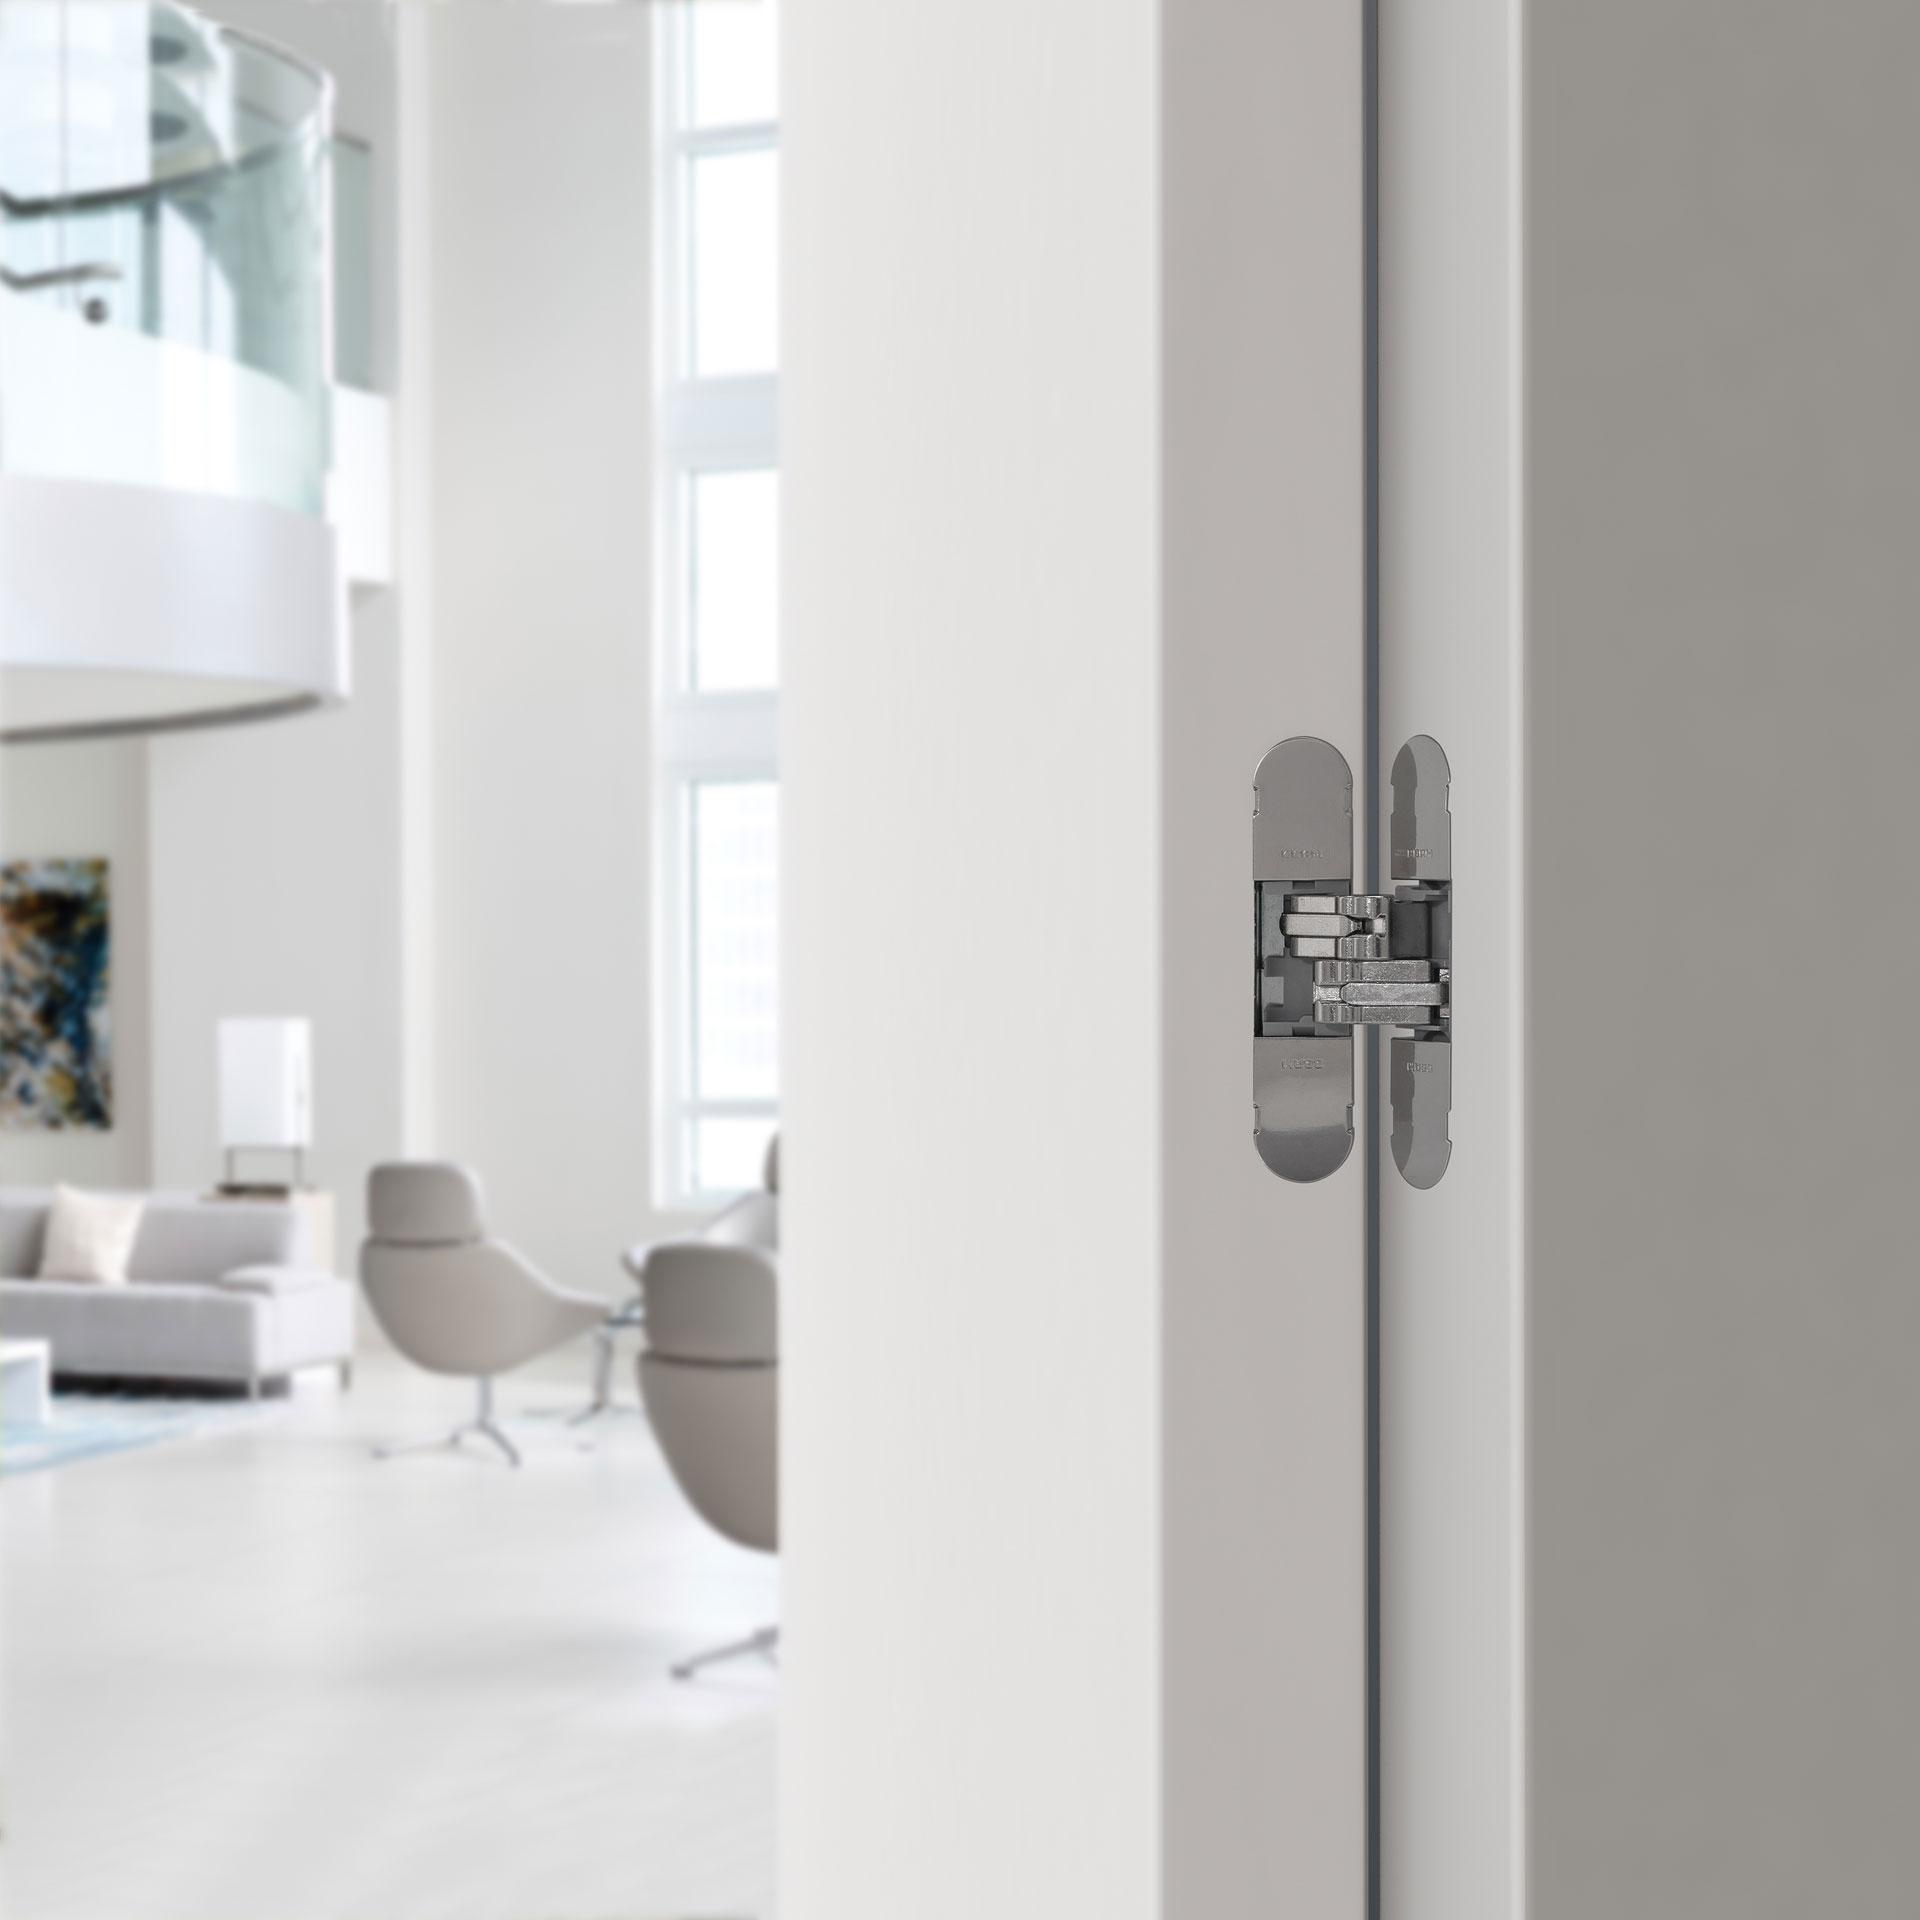 Cerniere per porte: cerniere a scomparsa 3D Mod.1229 | CEAM ITALIA